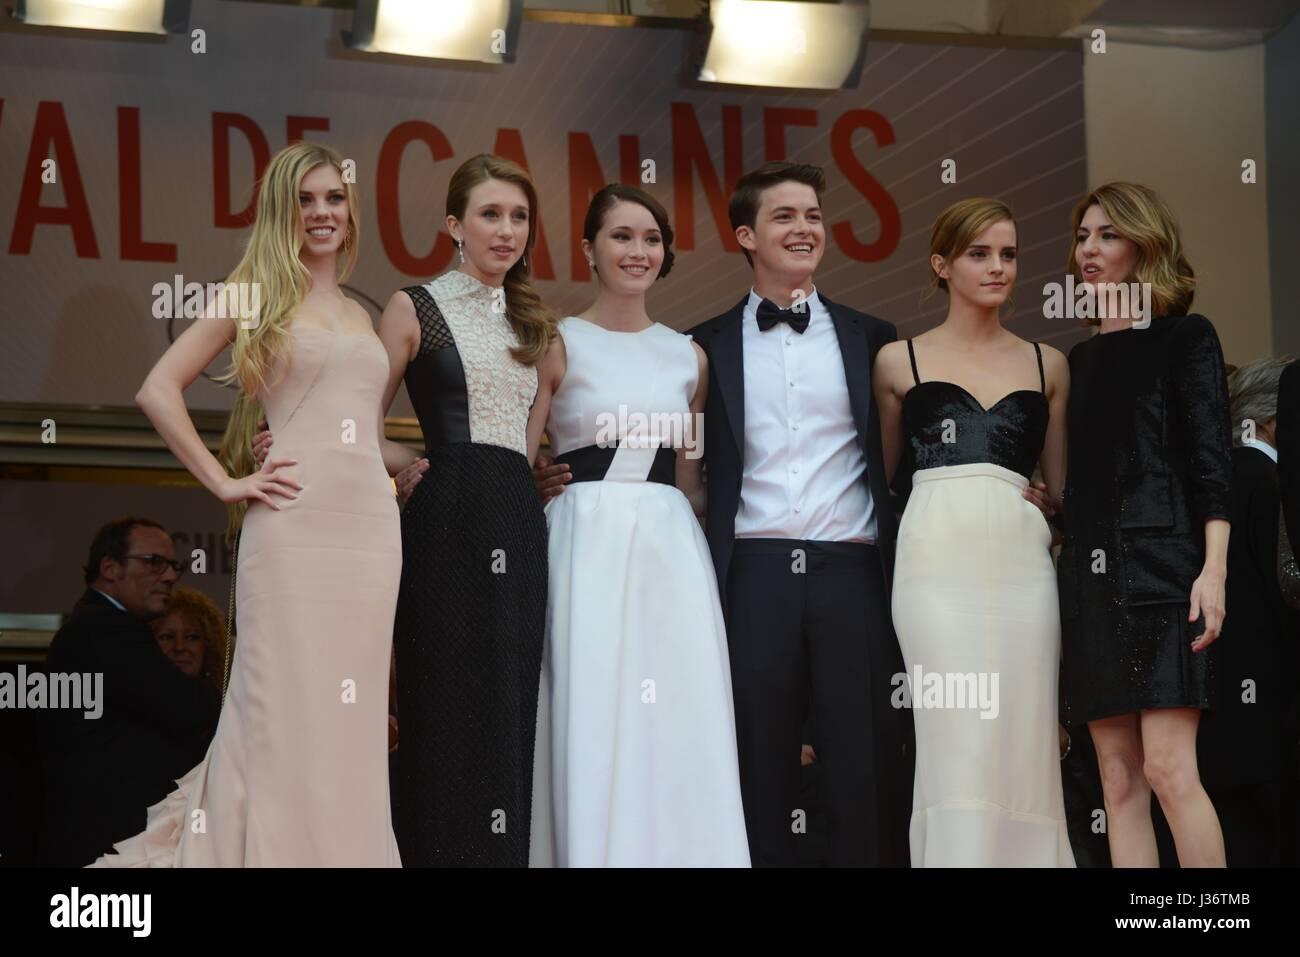 Equipe du film : Claire Julien, Taissa Farmiga, Katie Chang, Israel Broussard, Emma Watson, Sofia Coppola.  66e - Stock Image